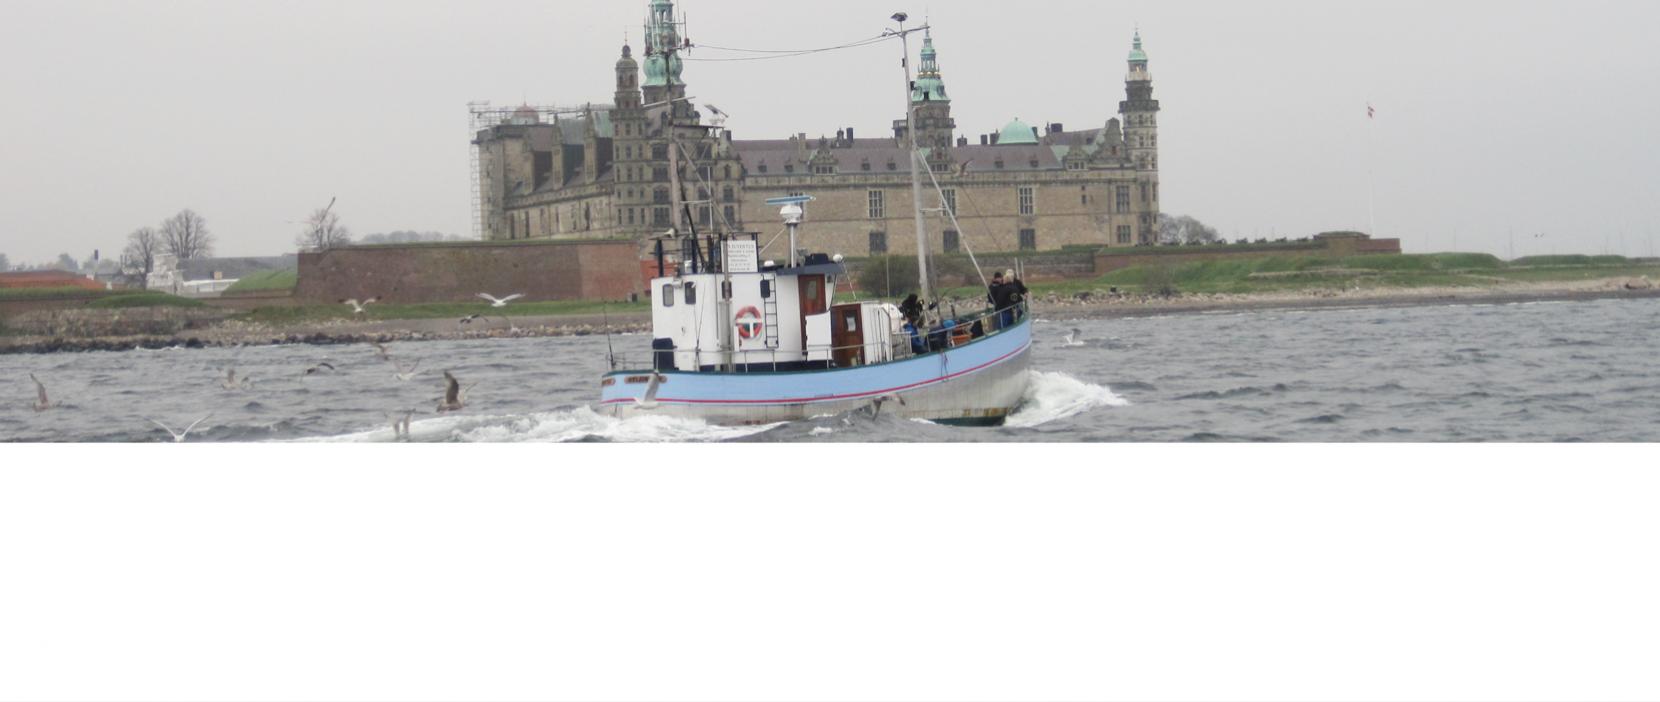 Vi sejler forbi Kronborg